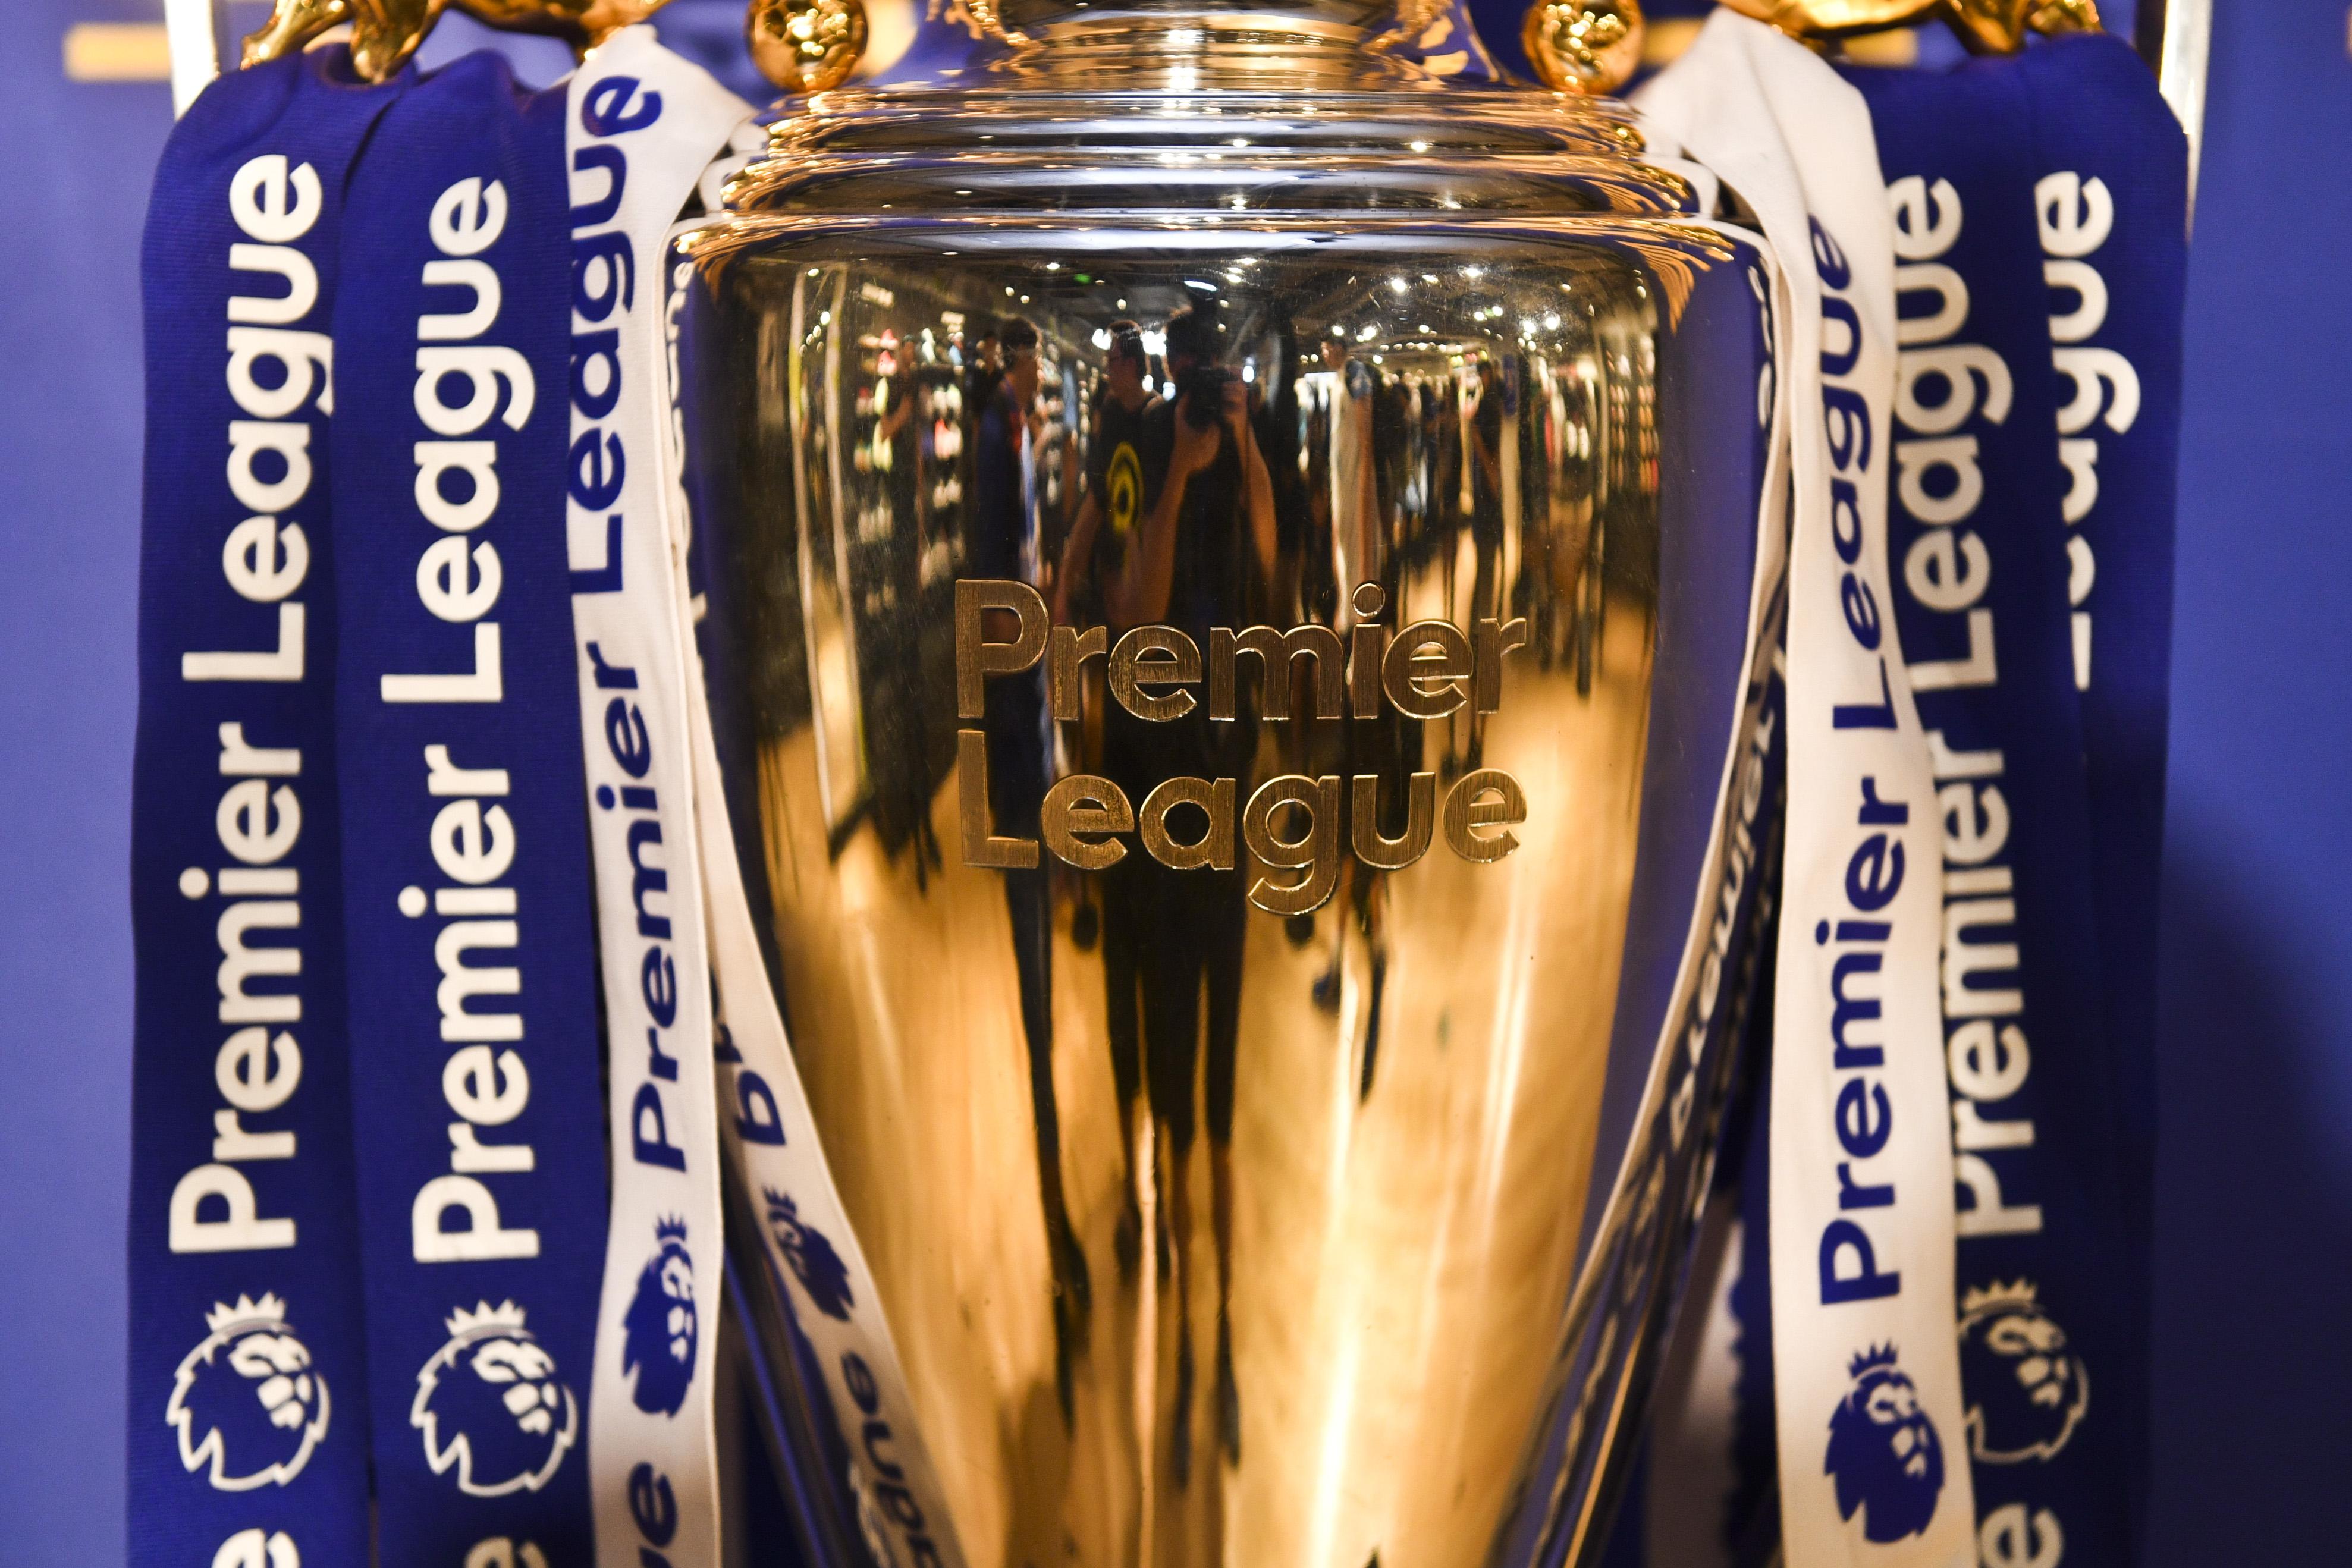 Chelsea v Arsenal - Preview